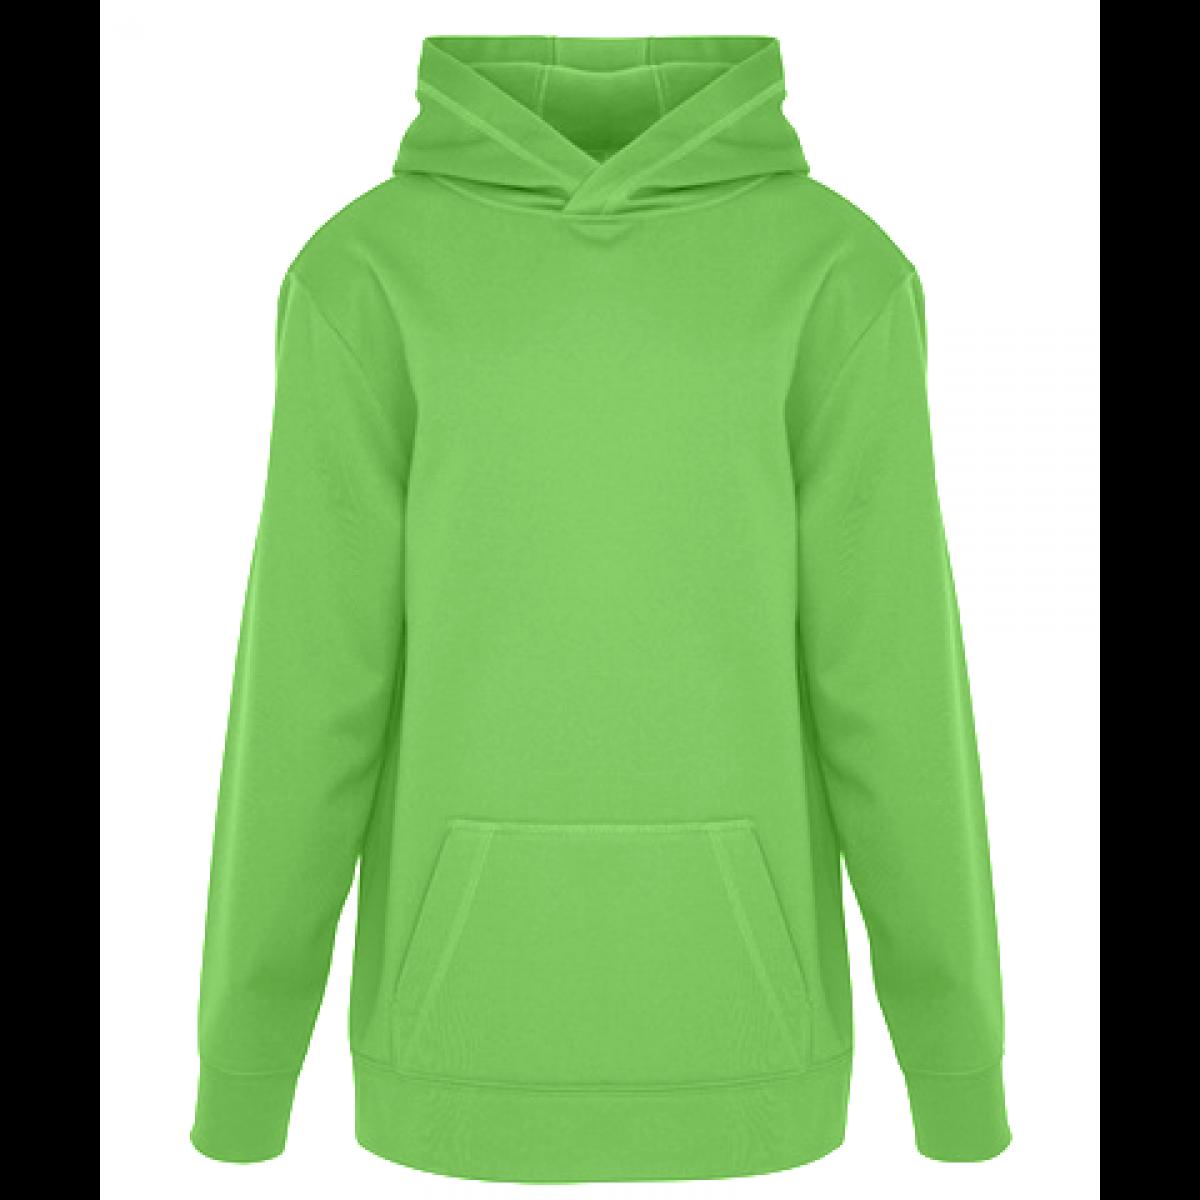 Game Day Fleece Hooded Ladies Sweatshirt-Lime Green-L